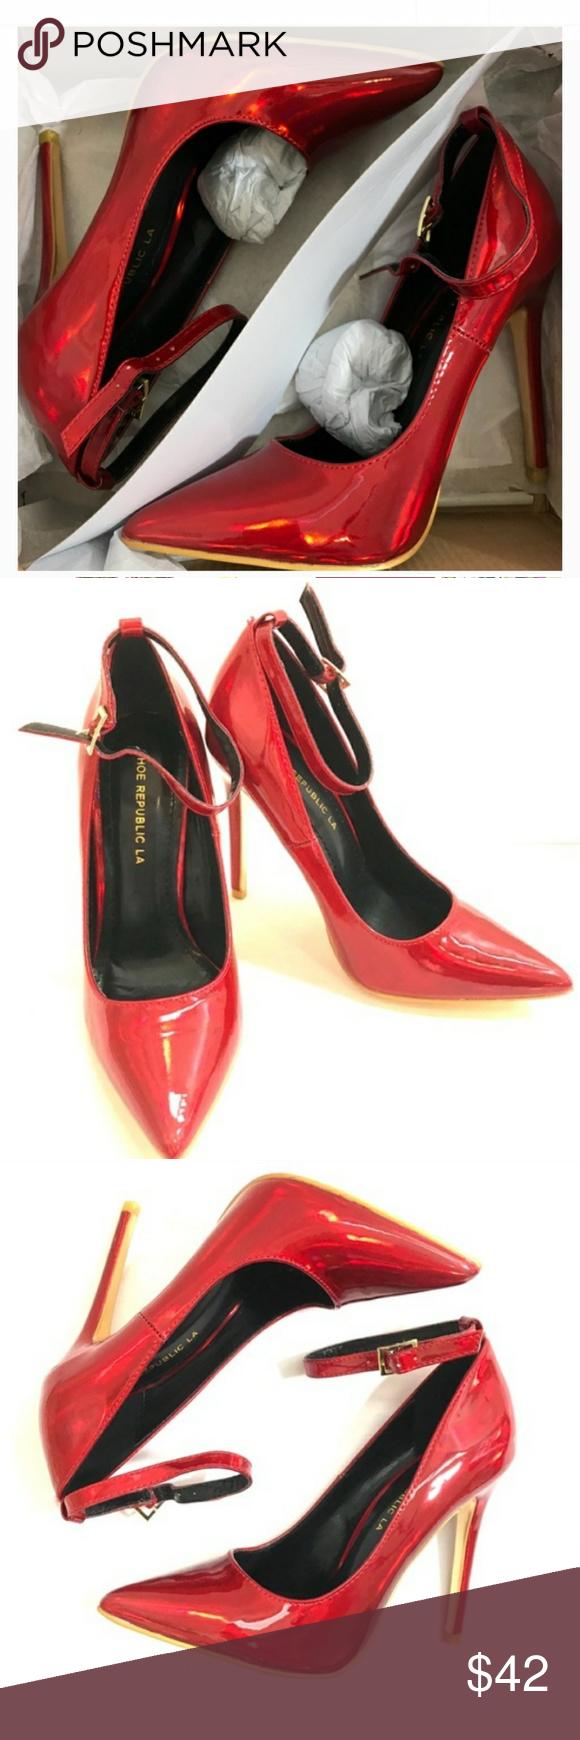 Shoe republic la holographic hologram red heels everyday shoes